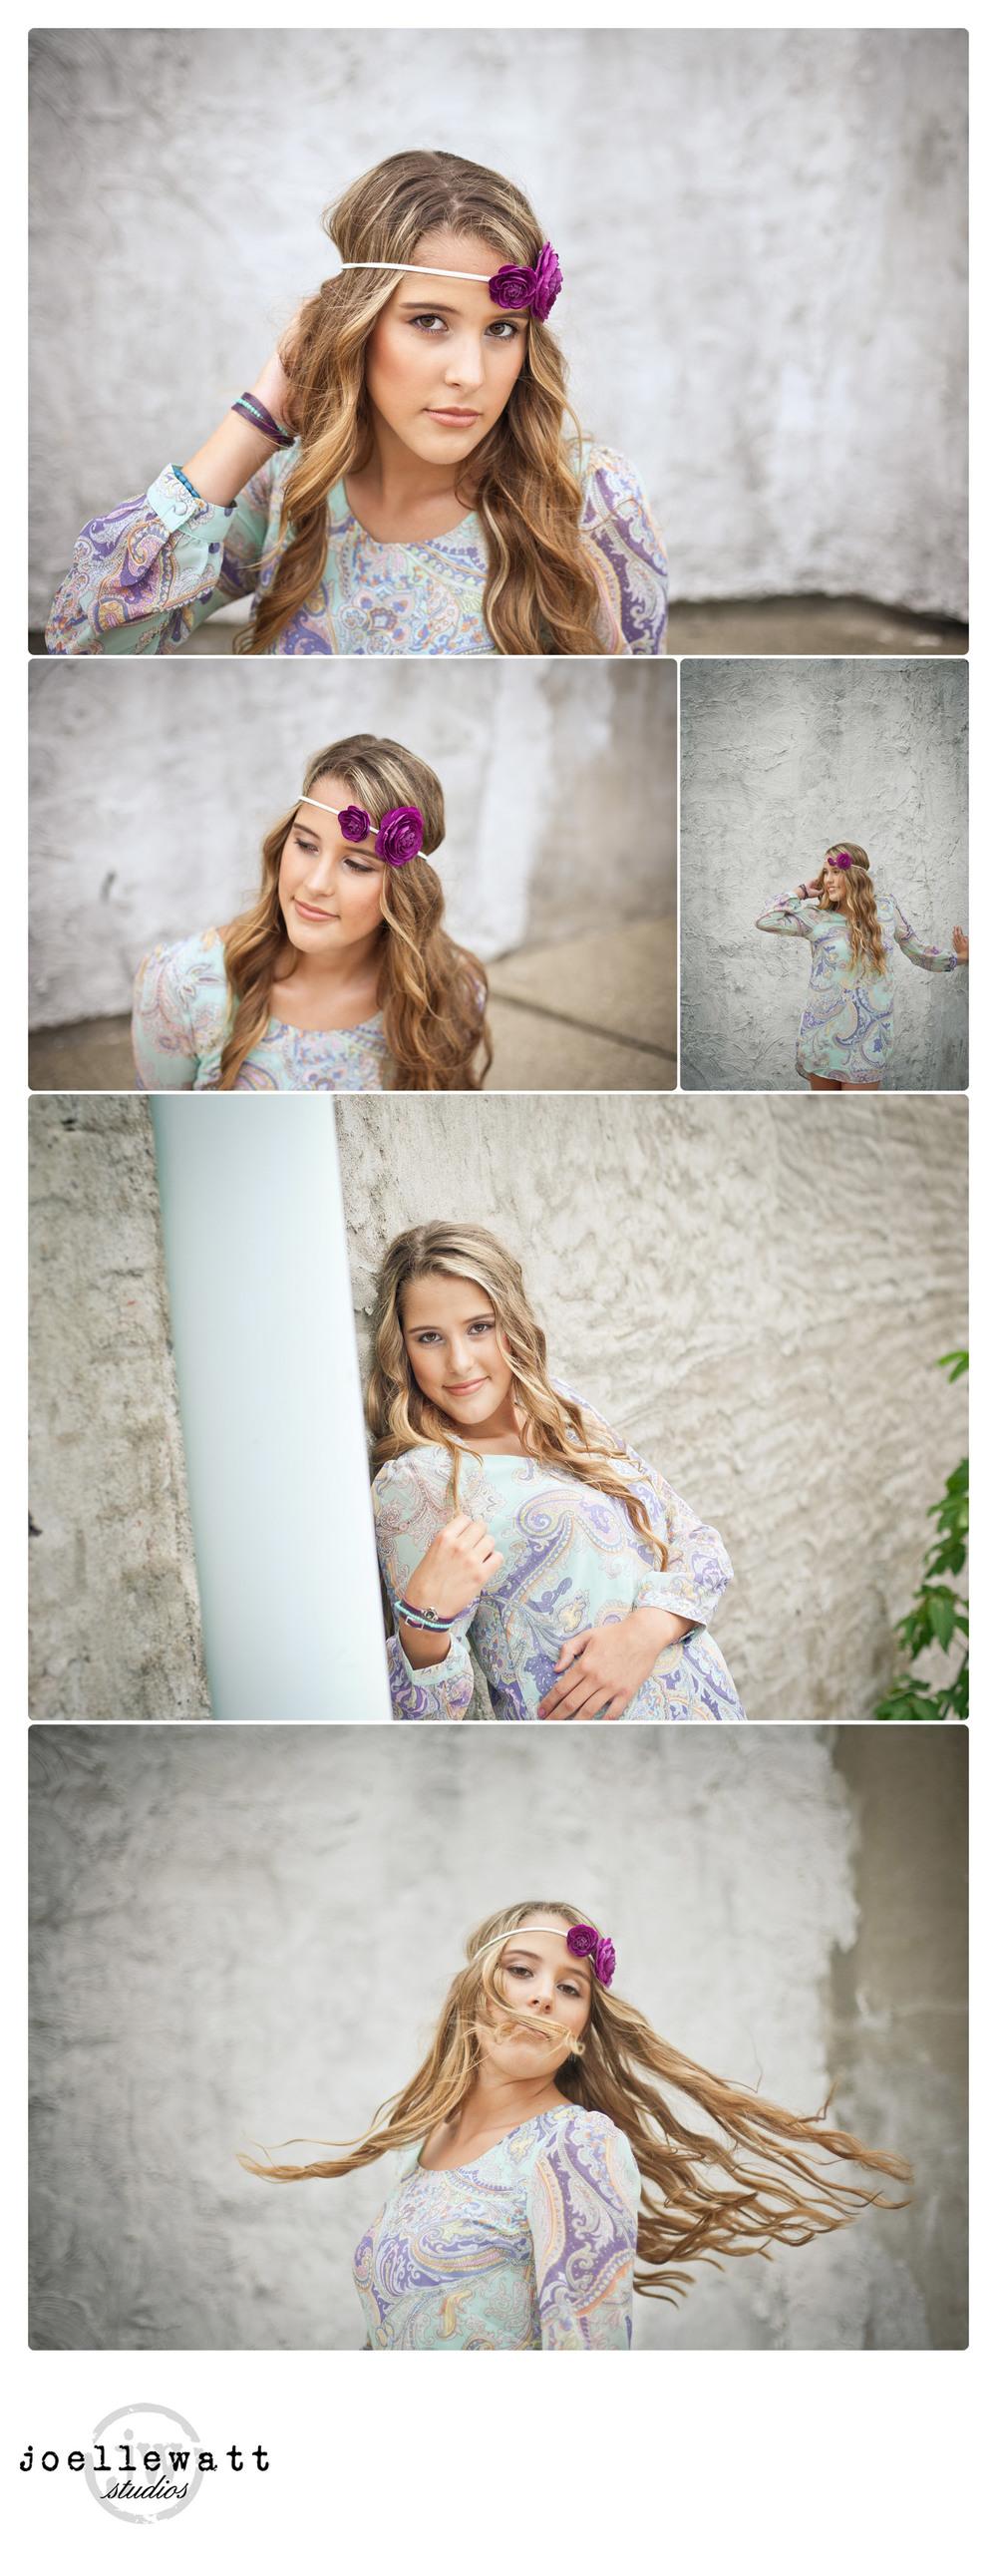 Blog-Collage-1375972939744.jpg